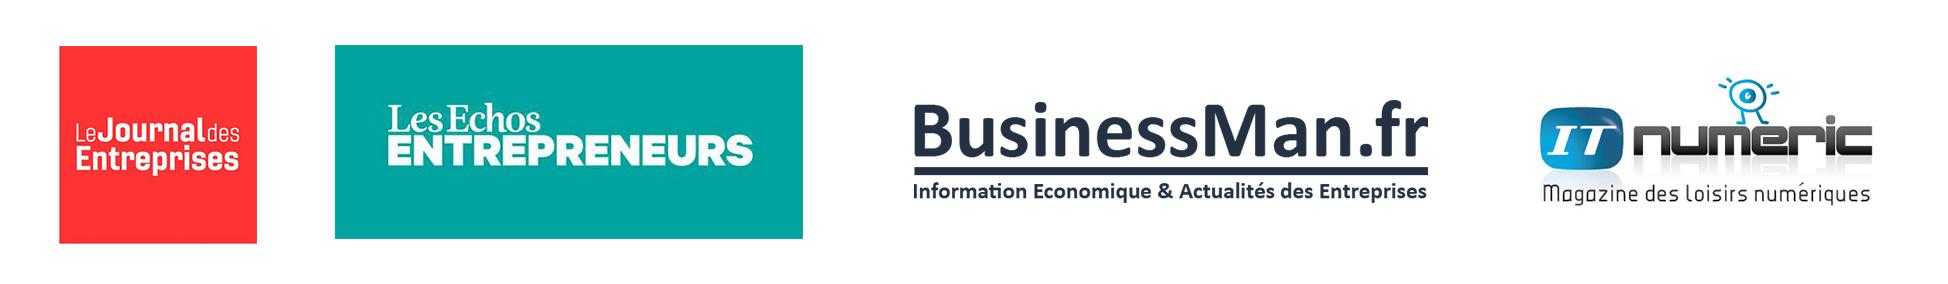 Logos JDE, Les Echos Entrepreneurs, BusinessMan.fr, ITnumeric